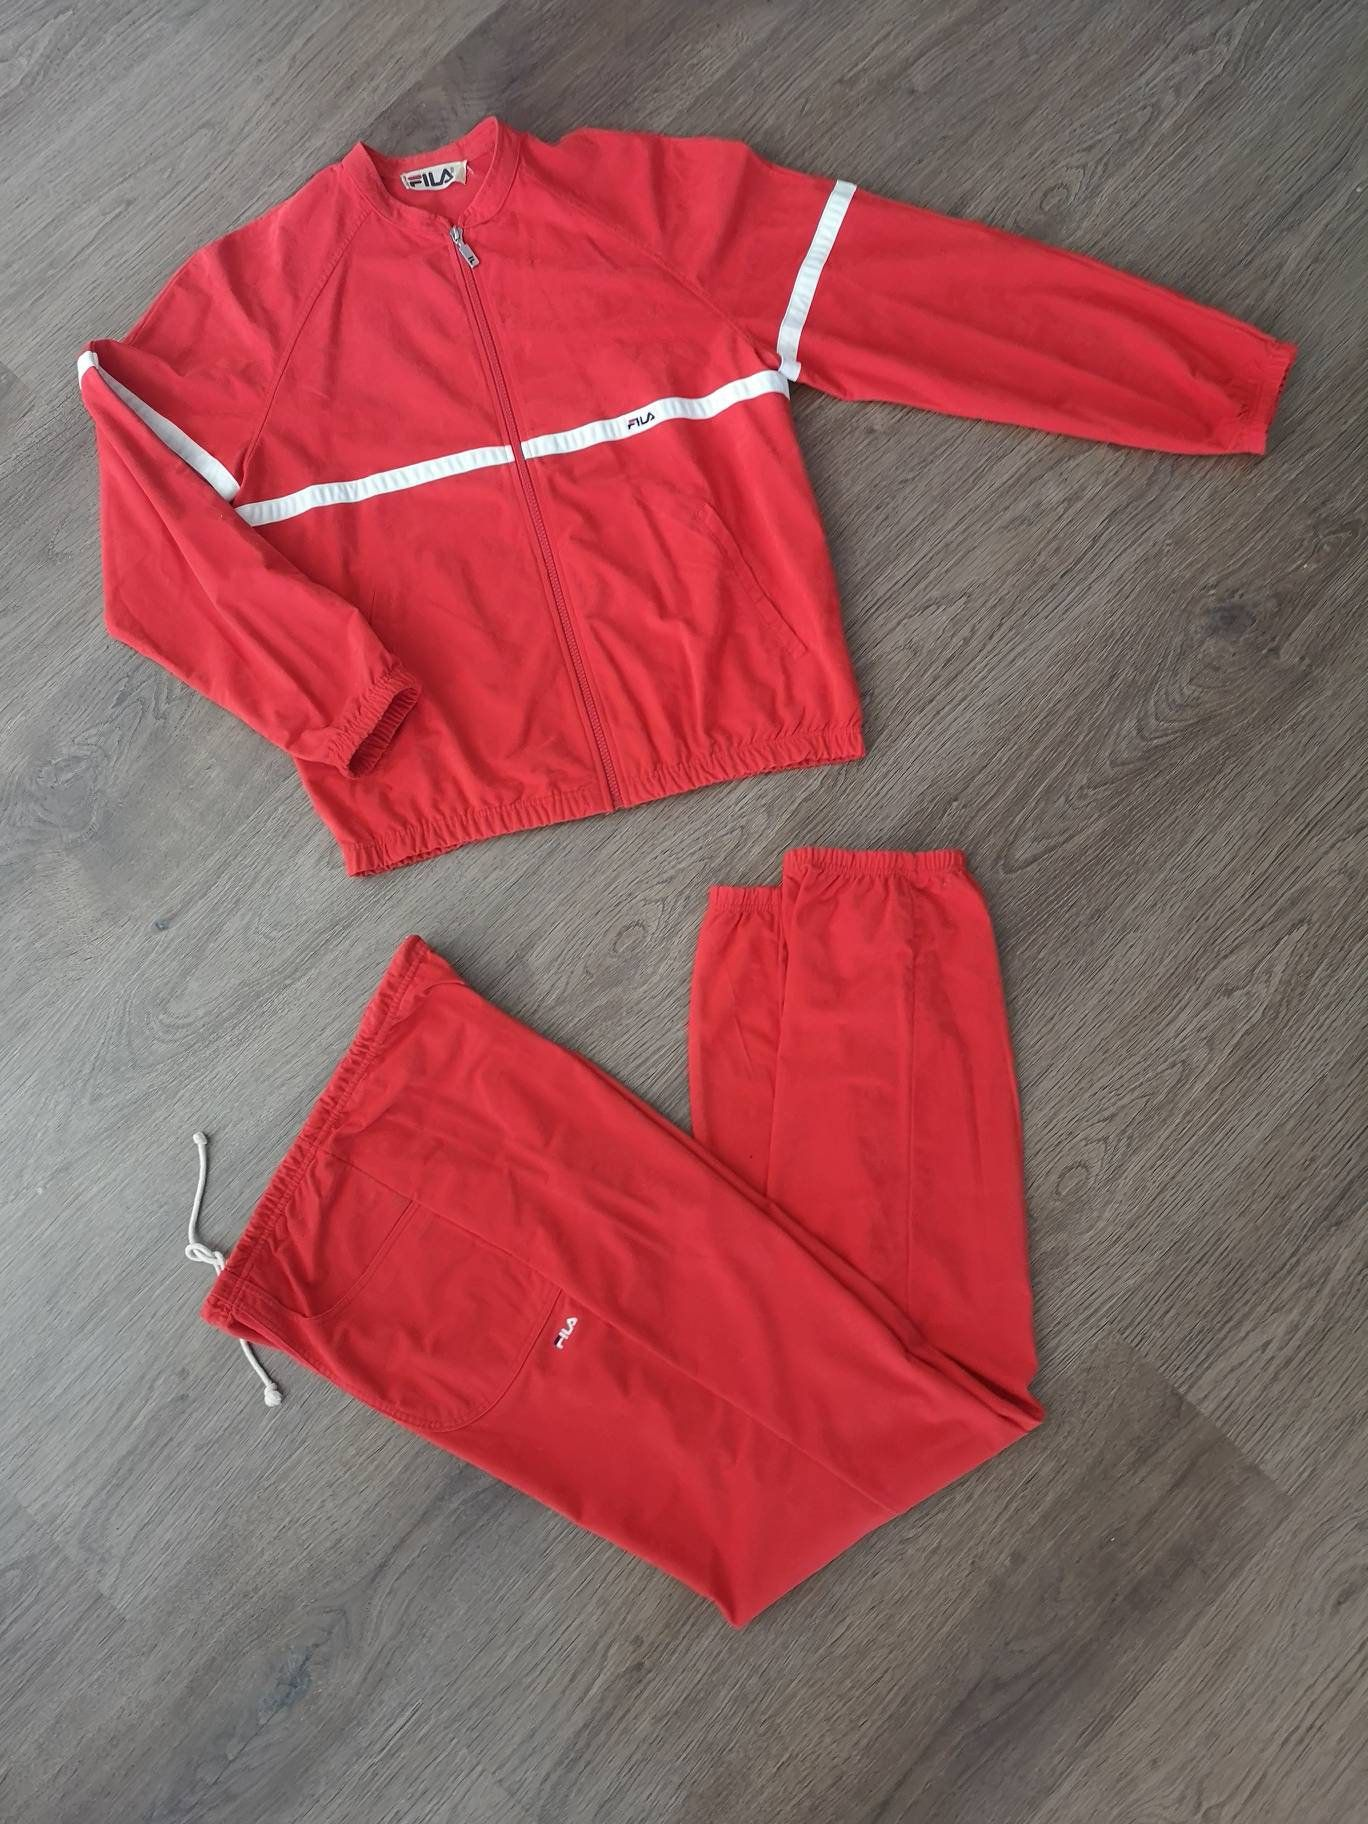 Pin von beyou_sHe auf sHe_90sVintage Dealer | Nike jacket